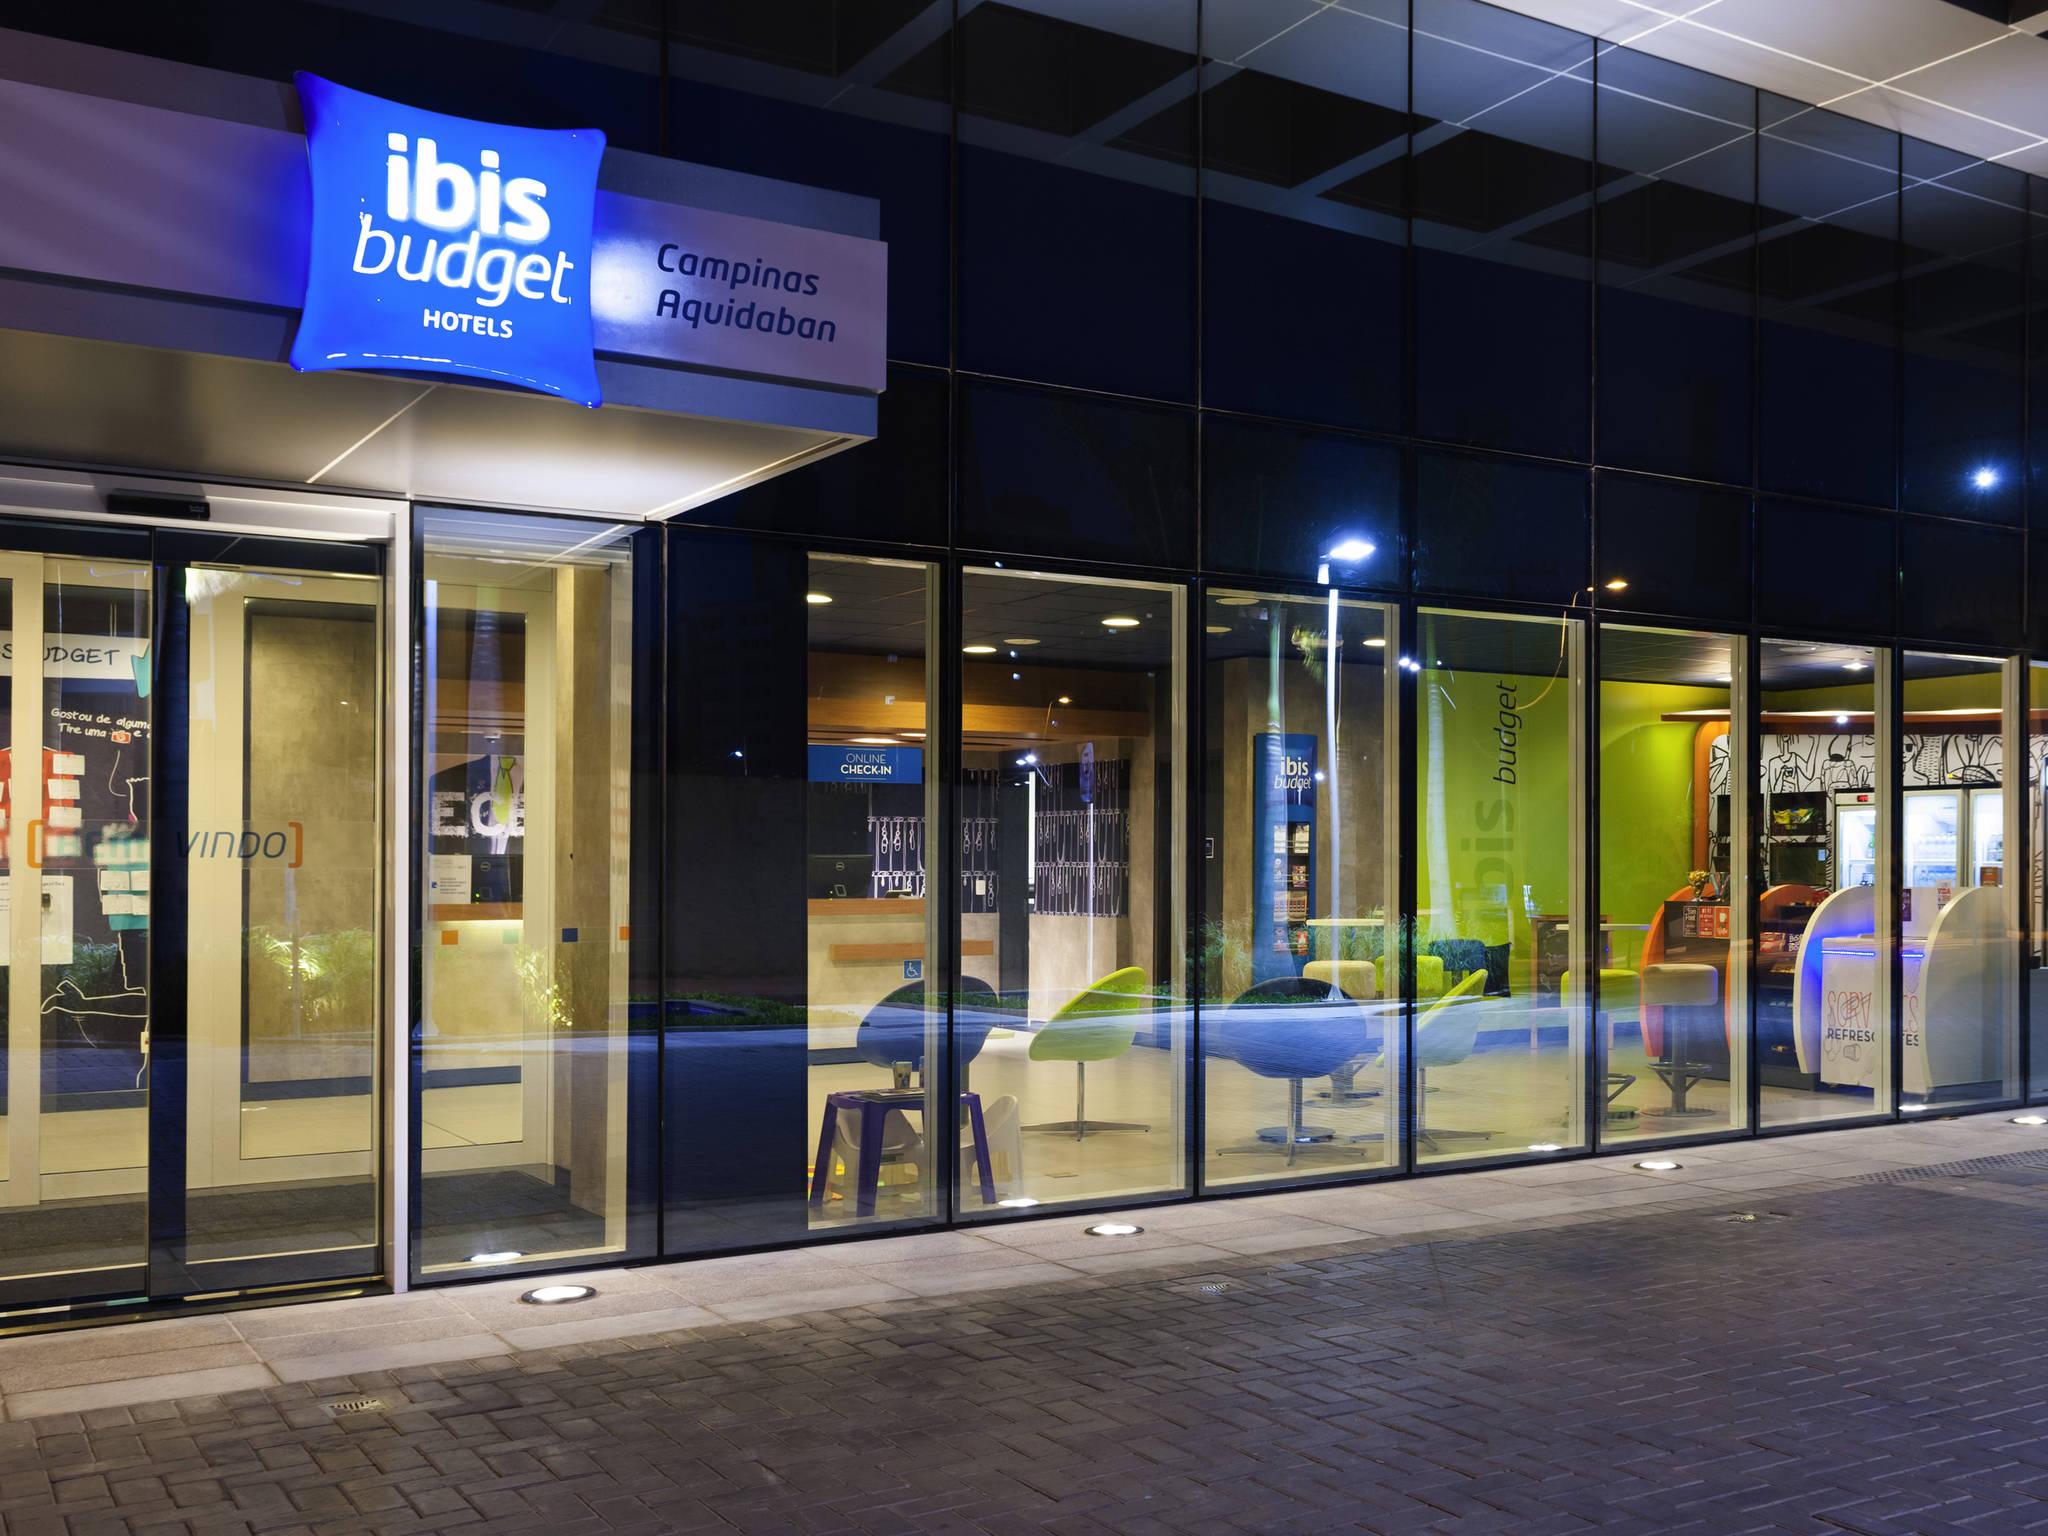 Hotel – ibis budget Campinas Aquidaban